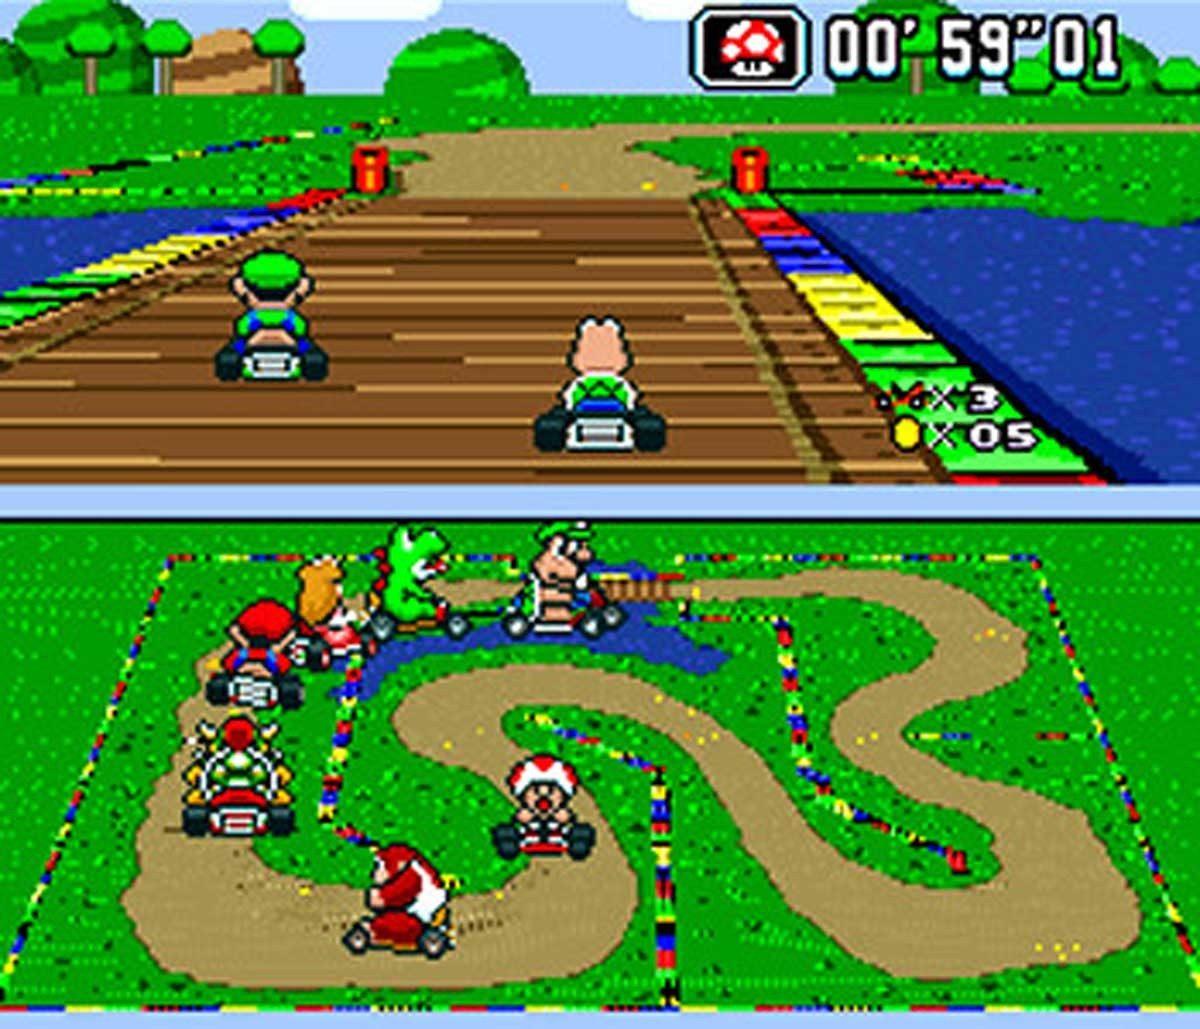 The Mario Kart Retrospective. Part Eight - Mario Kart 8 51b09812b006c